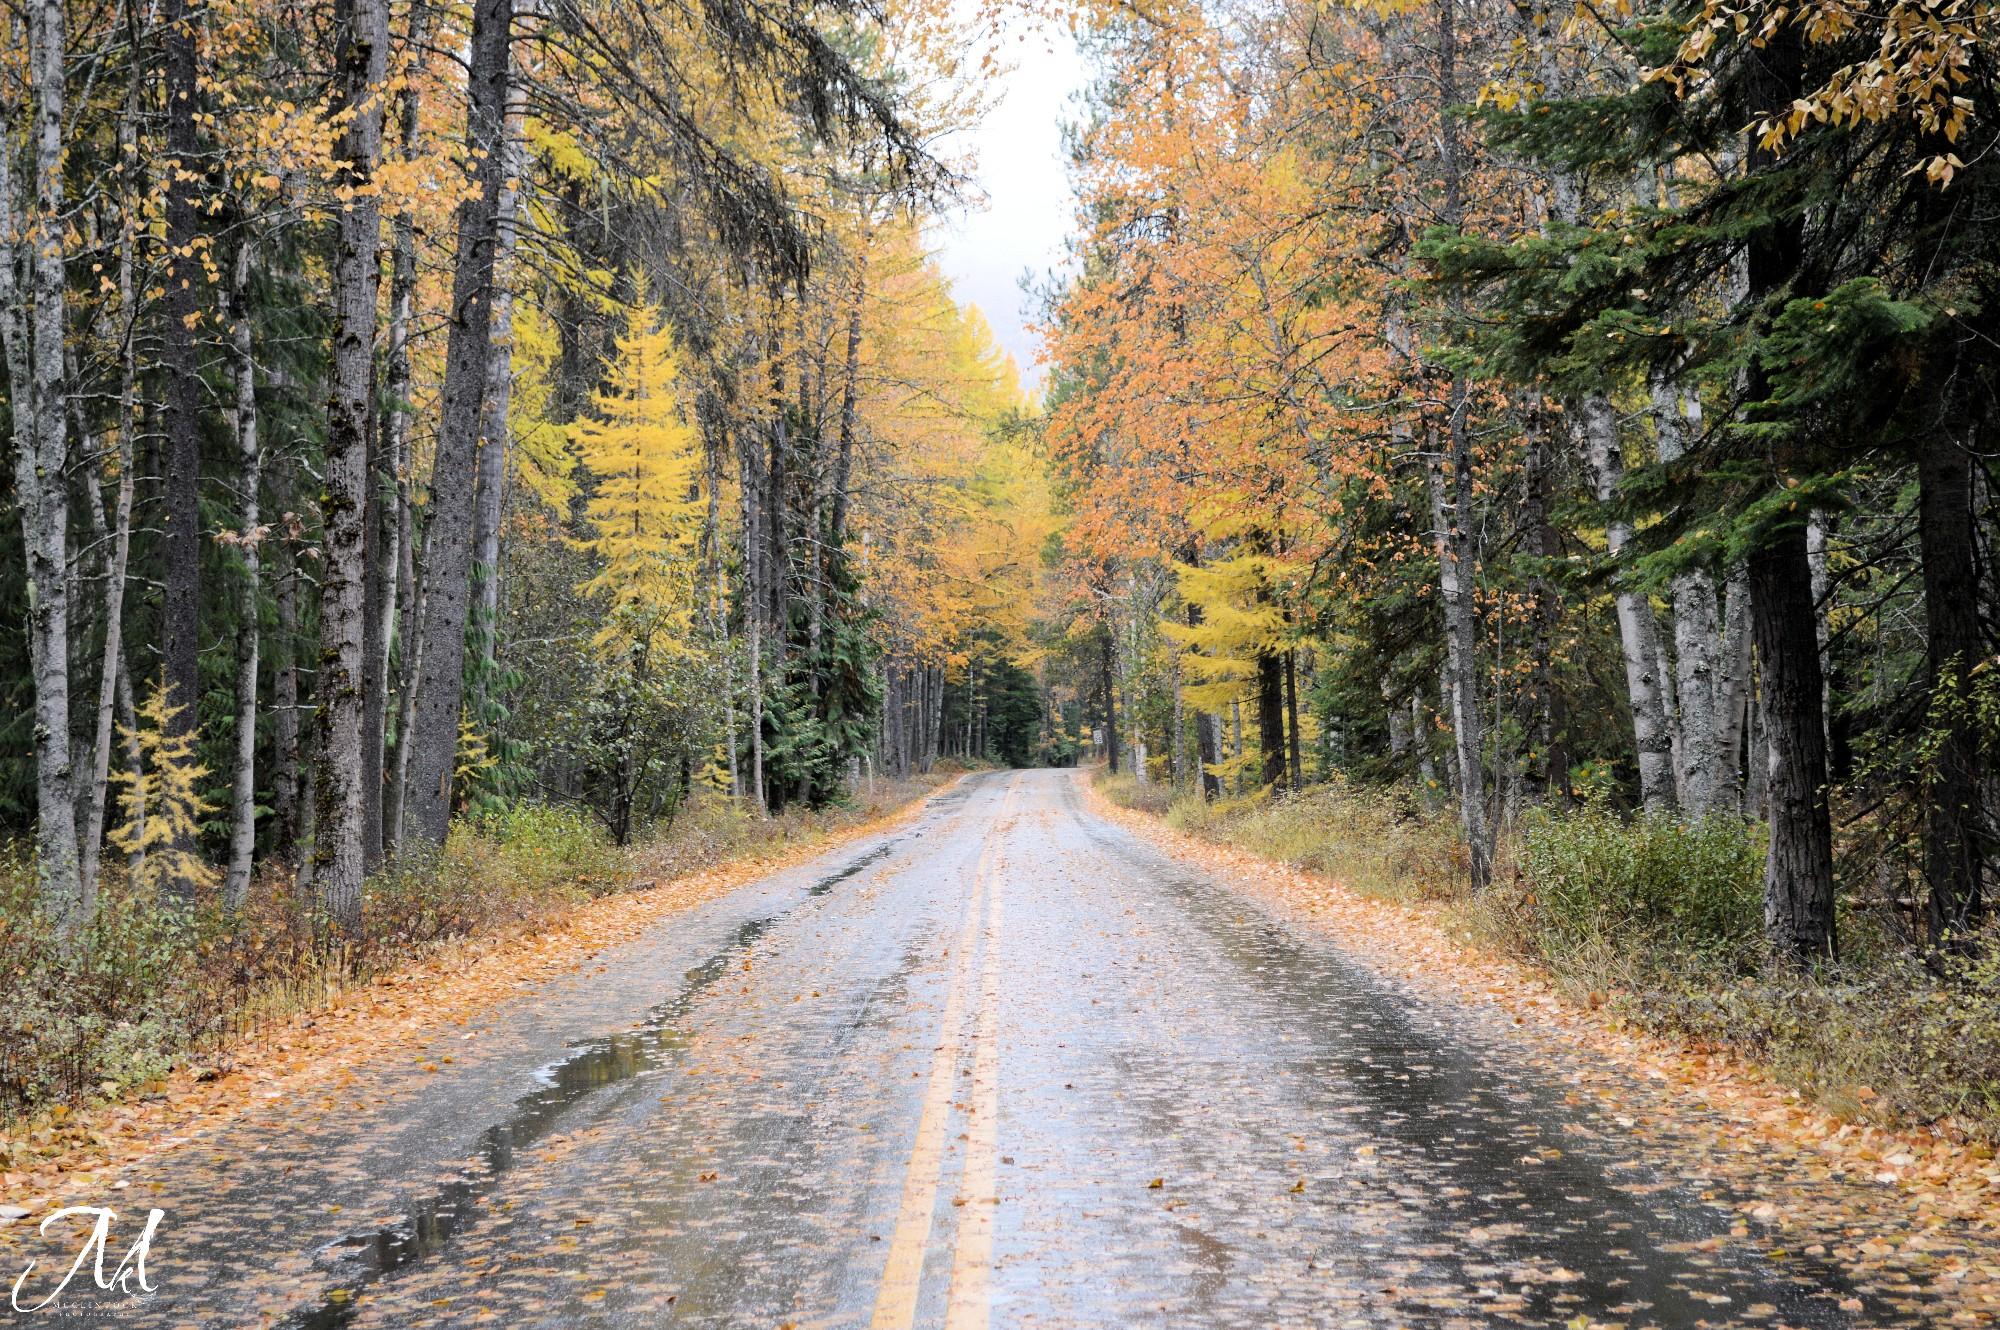 October Rain in Glacier National Park_MKMcClintock | #photography #GlacierPark #mountains #emptyroad